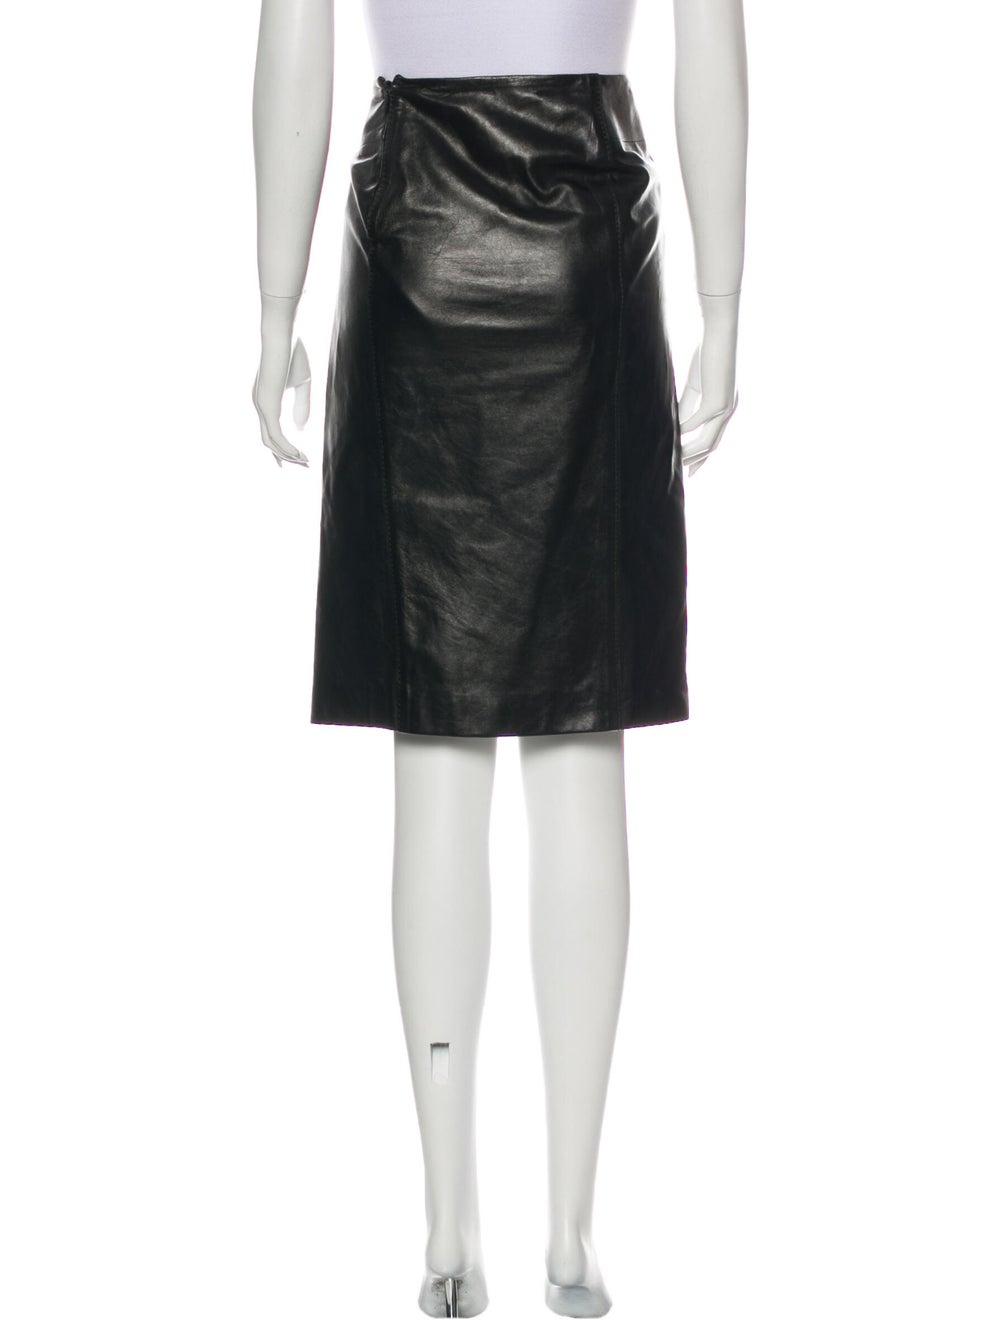 Gucci Leather Knee-Length Skirt Black - image 3